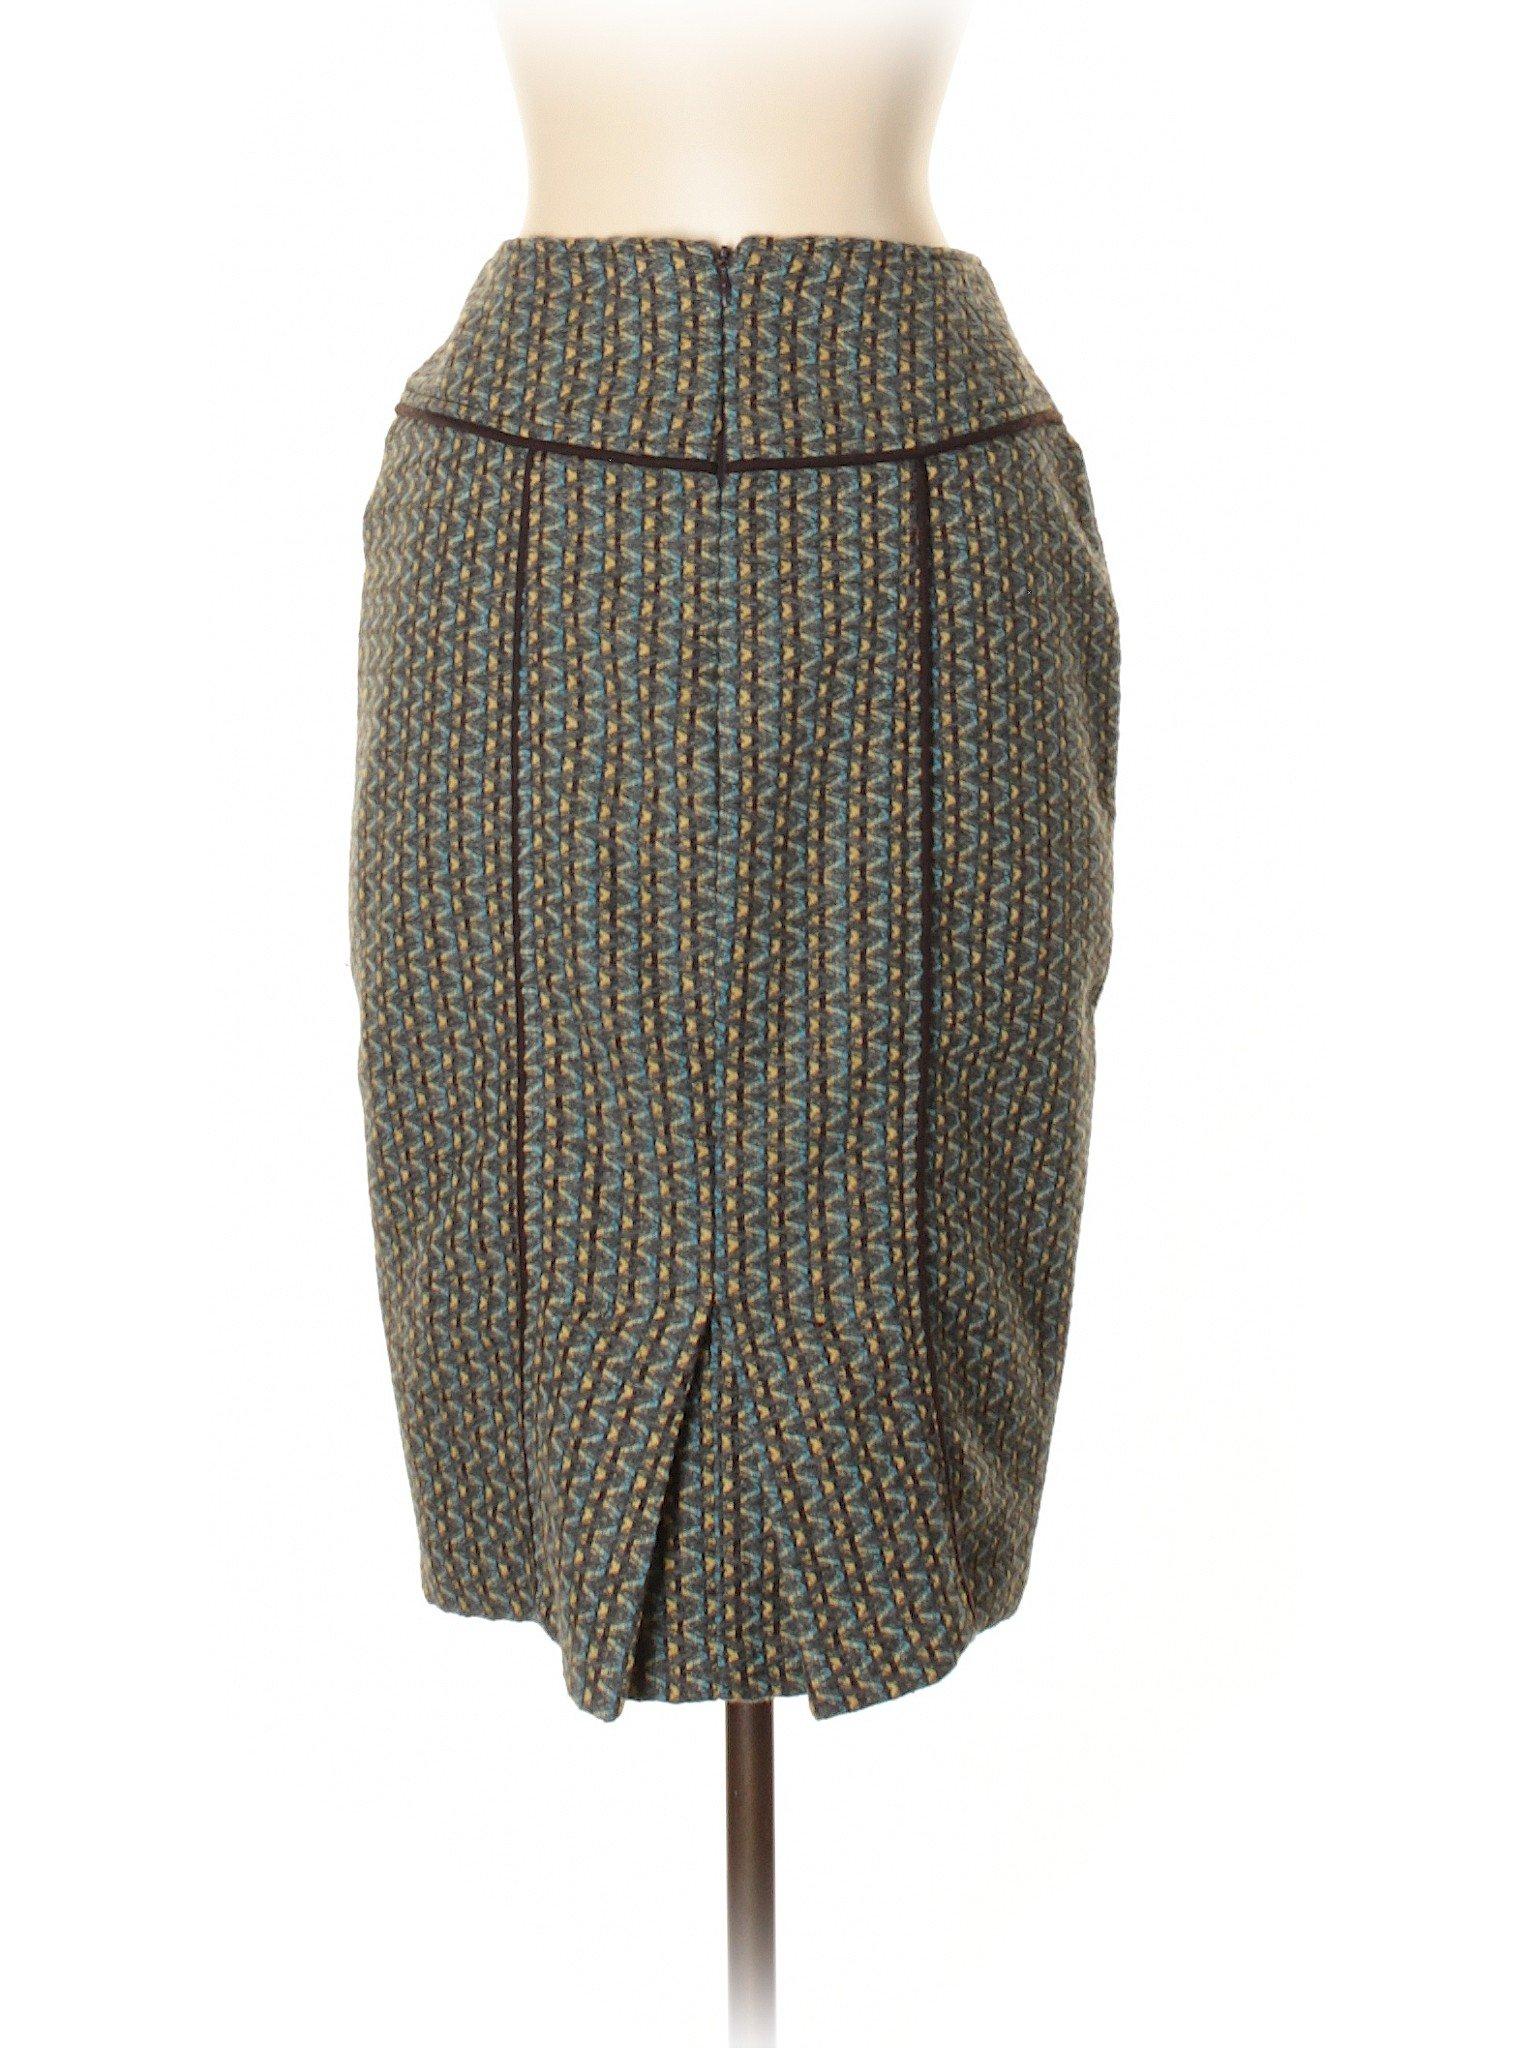 Boutique Casual Casual Boutique Skirt Skirt Boutique UqUw4ar